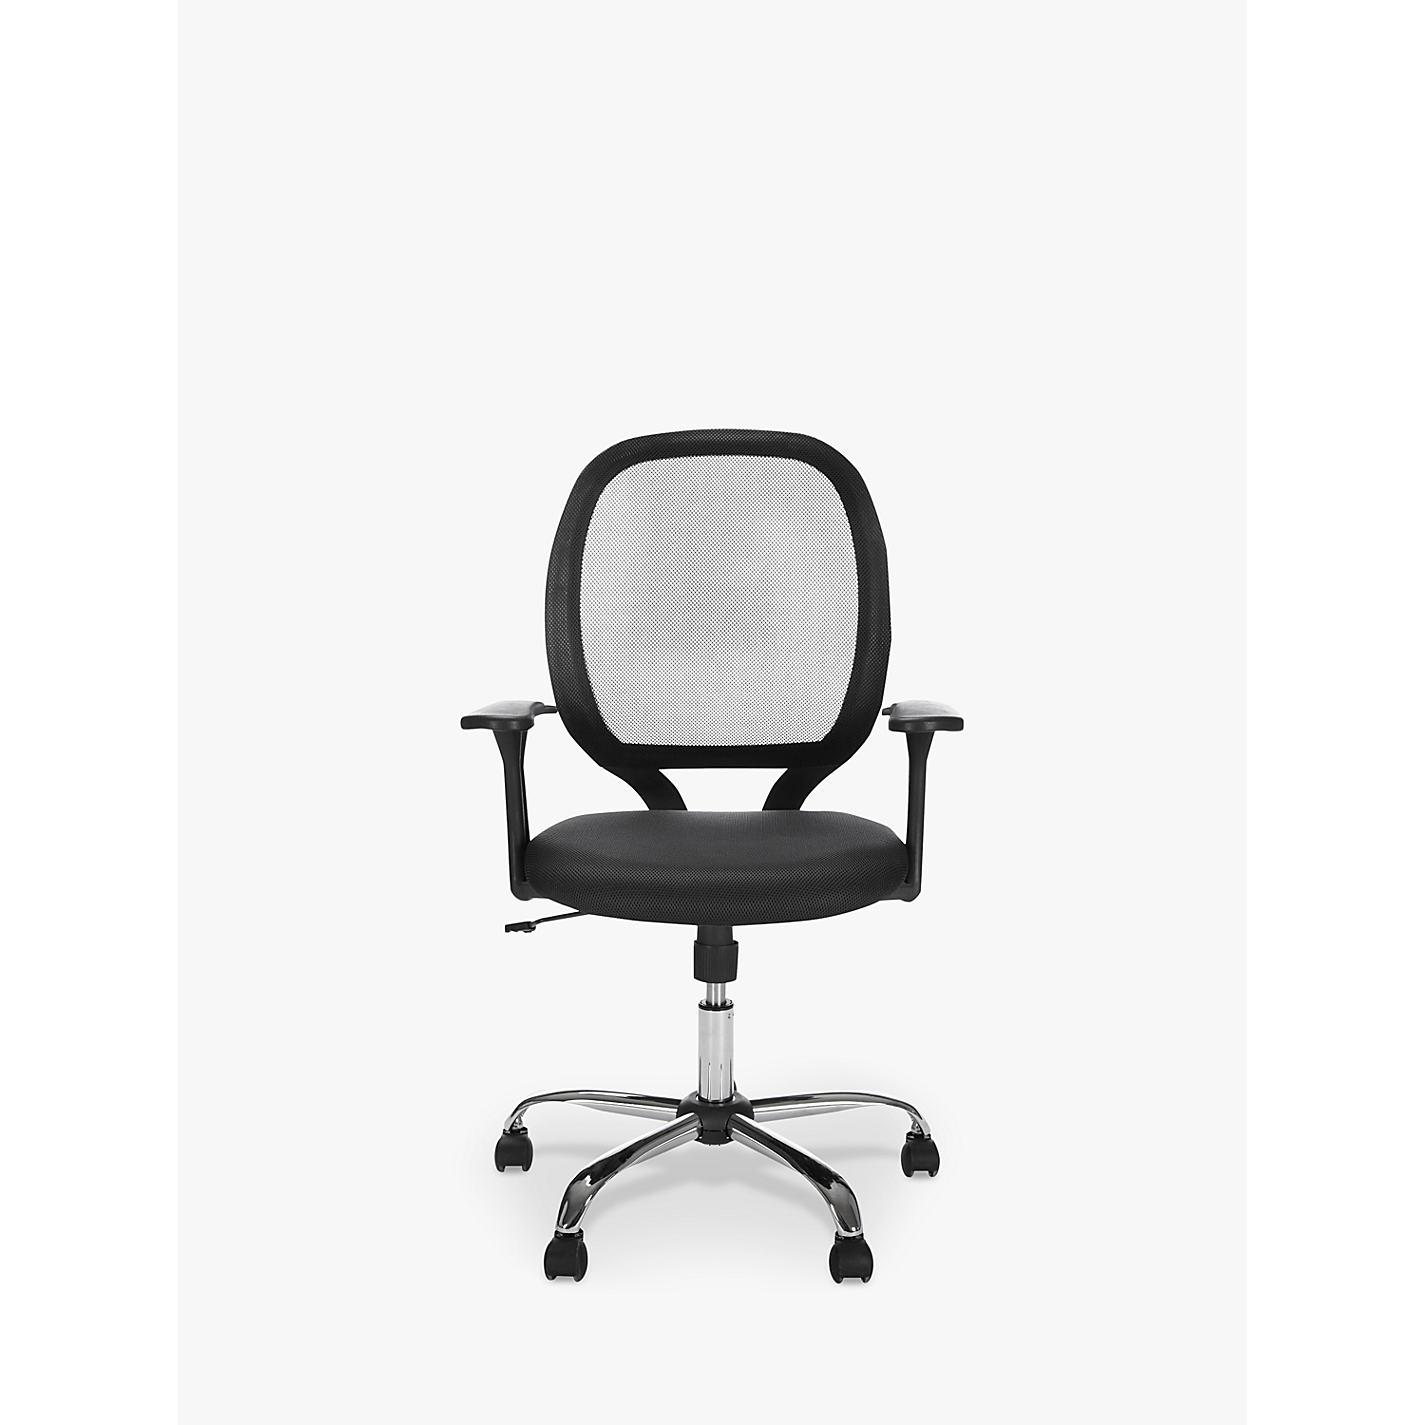 Luxury Mesh Office Chair Rtty1 Com Rtty1 Com